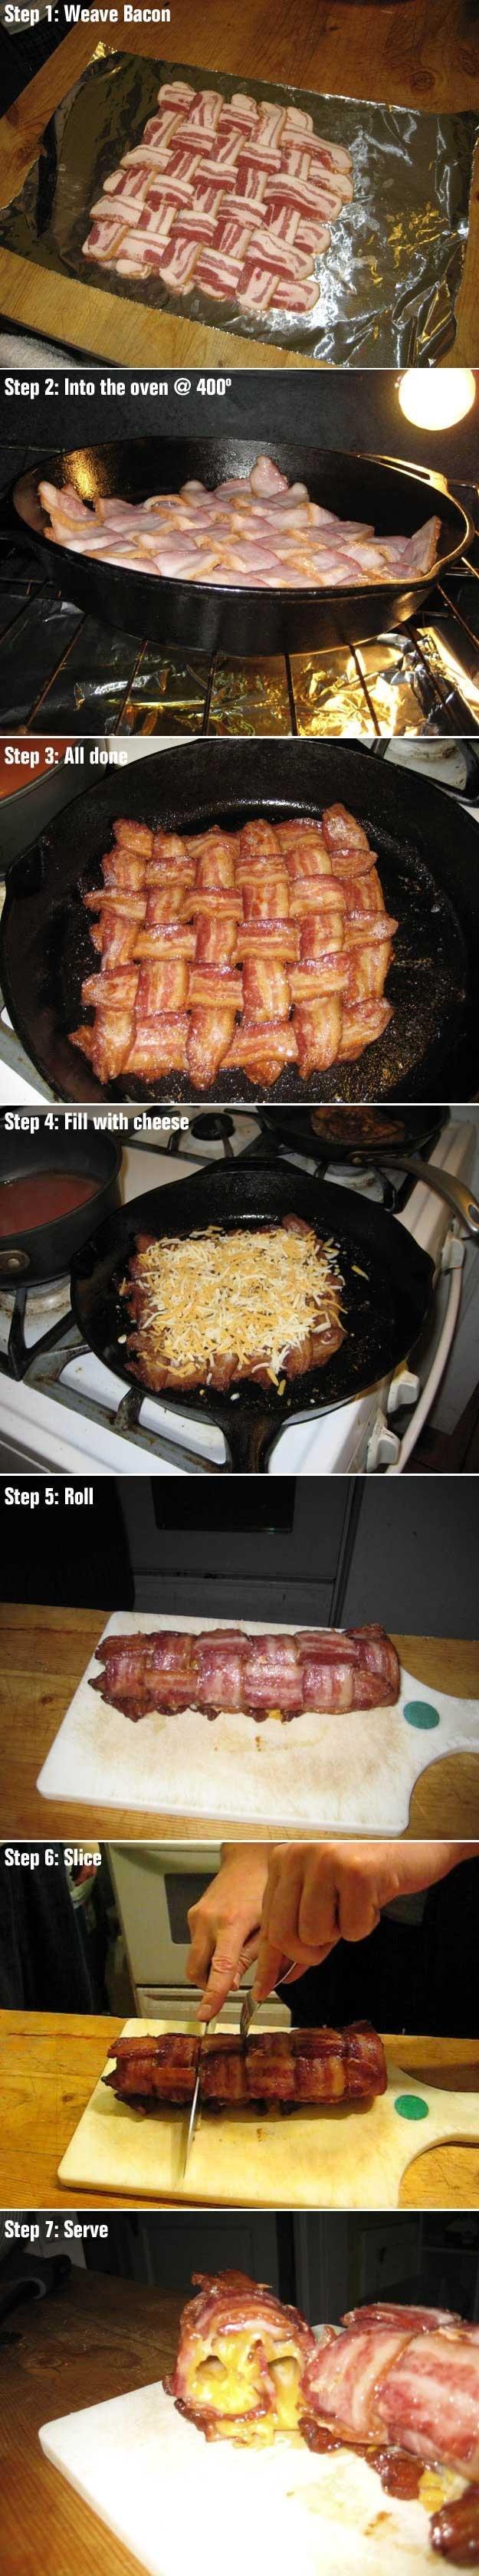 The Bacon Roll™. ITT: I teach you phaggots how to make a bacon roll.